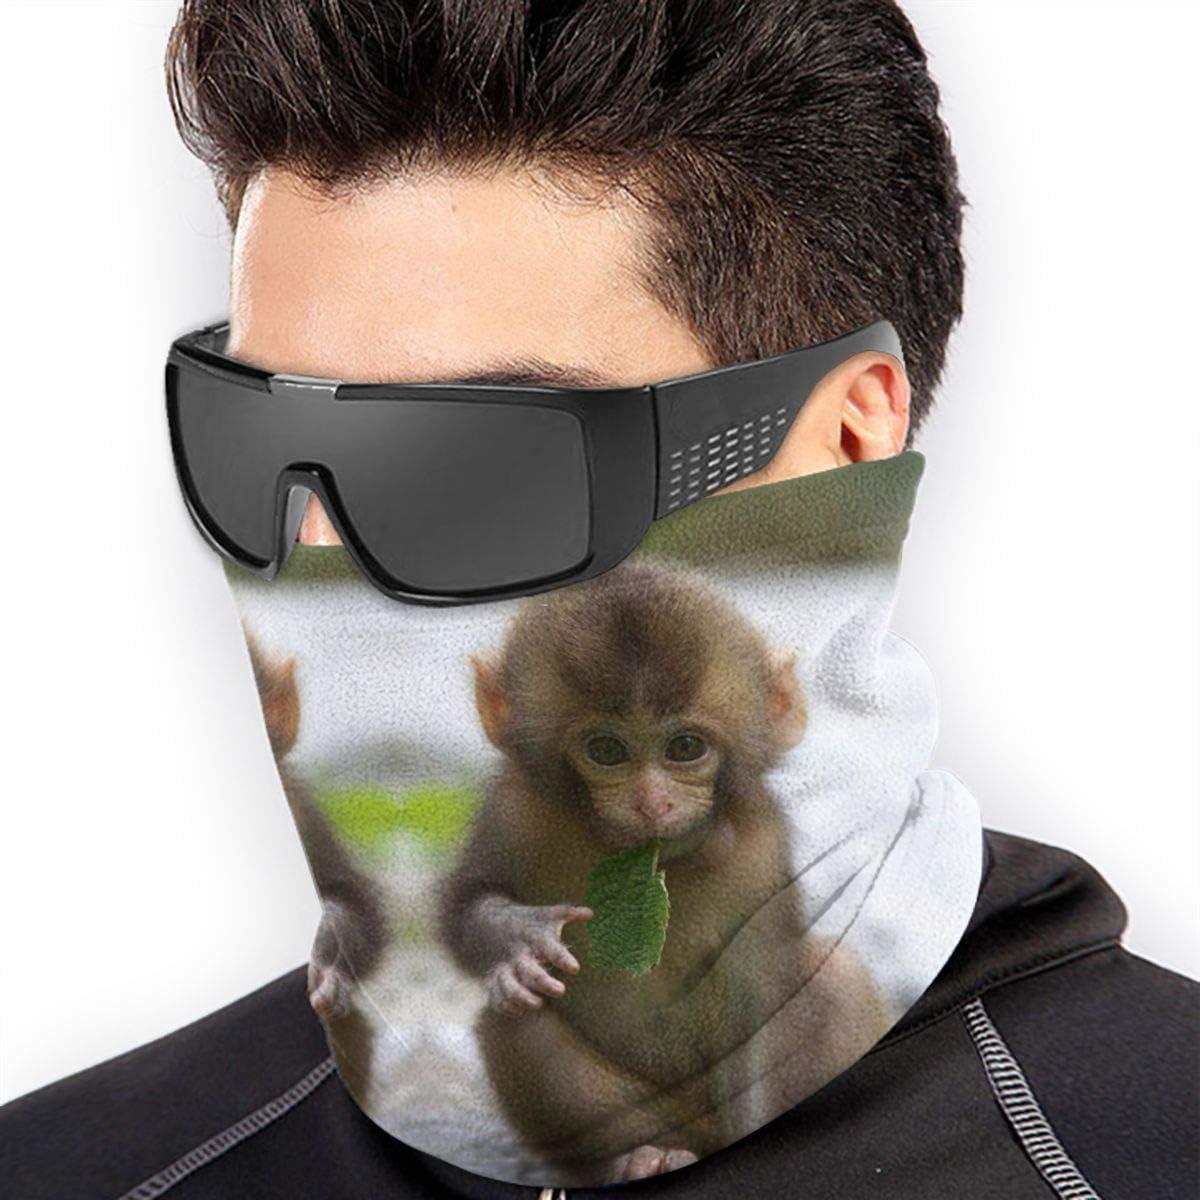 Monkey Neck Gaiter Headwear Headband Head Wrap Scarf Mask Neck/Ear Warmers Headbands Perfect For Winter Fishing, Hiking, Running, Motorcycle Etc& Daily Wear For Men And Women